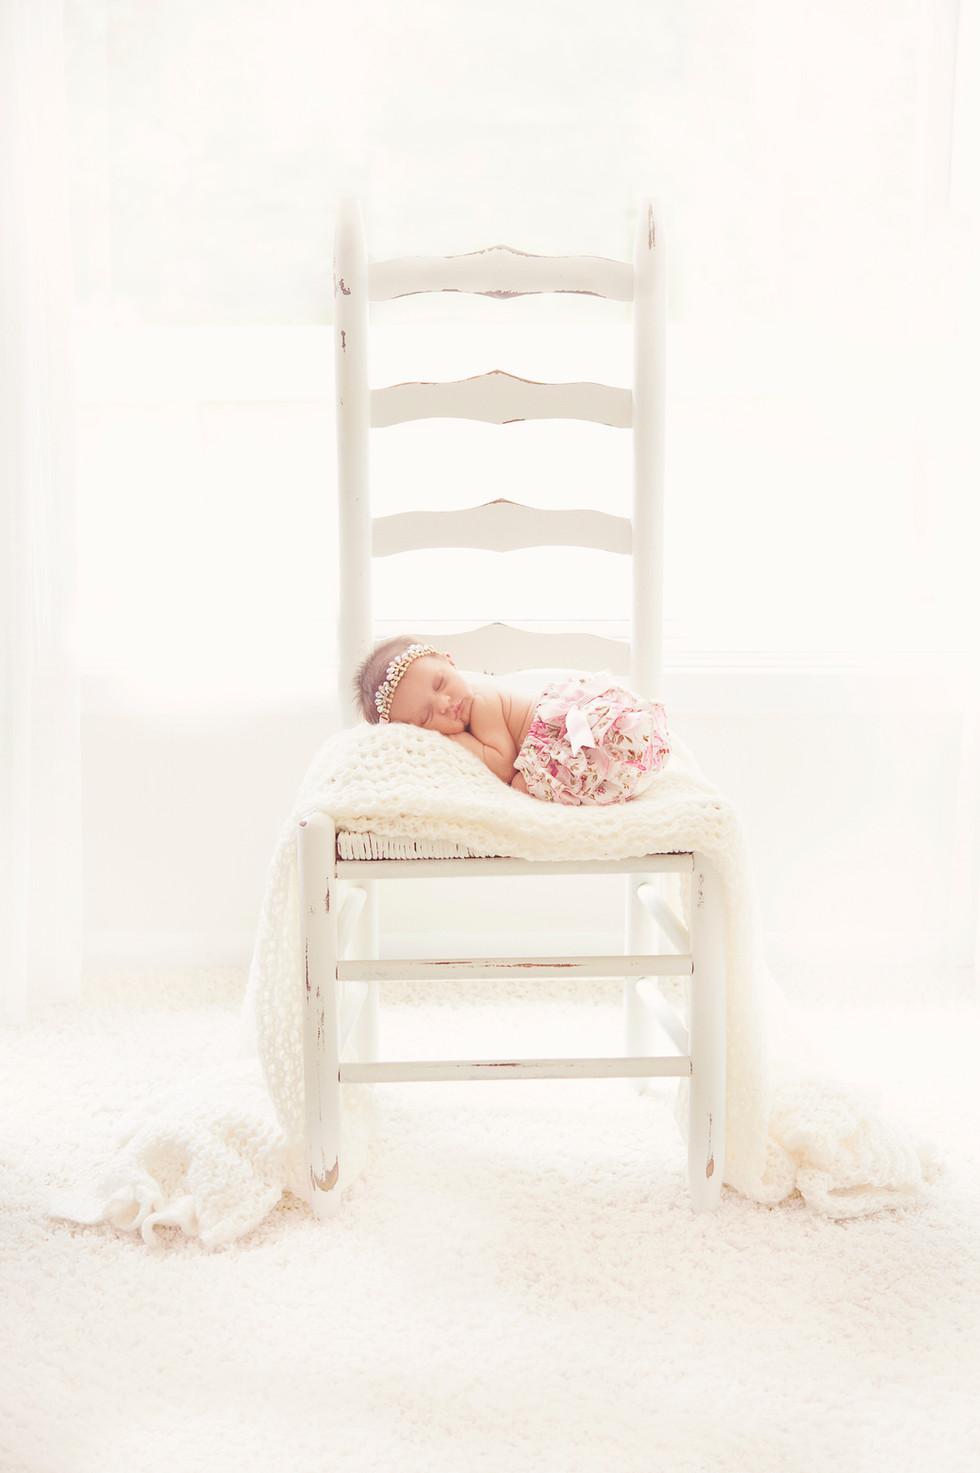 Shabby Chic Newborn on Chair